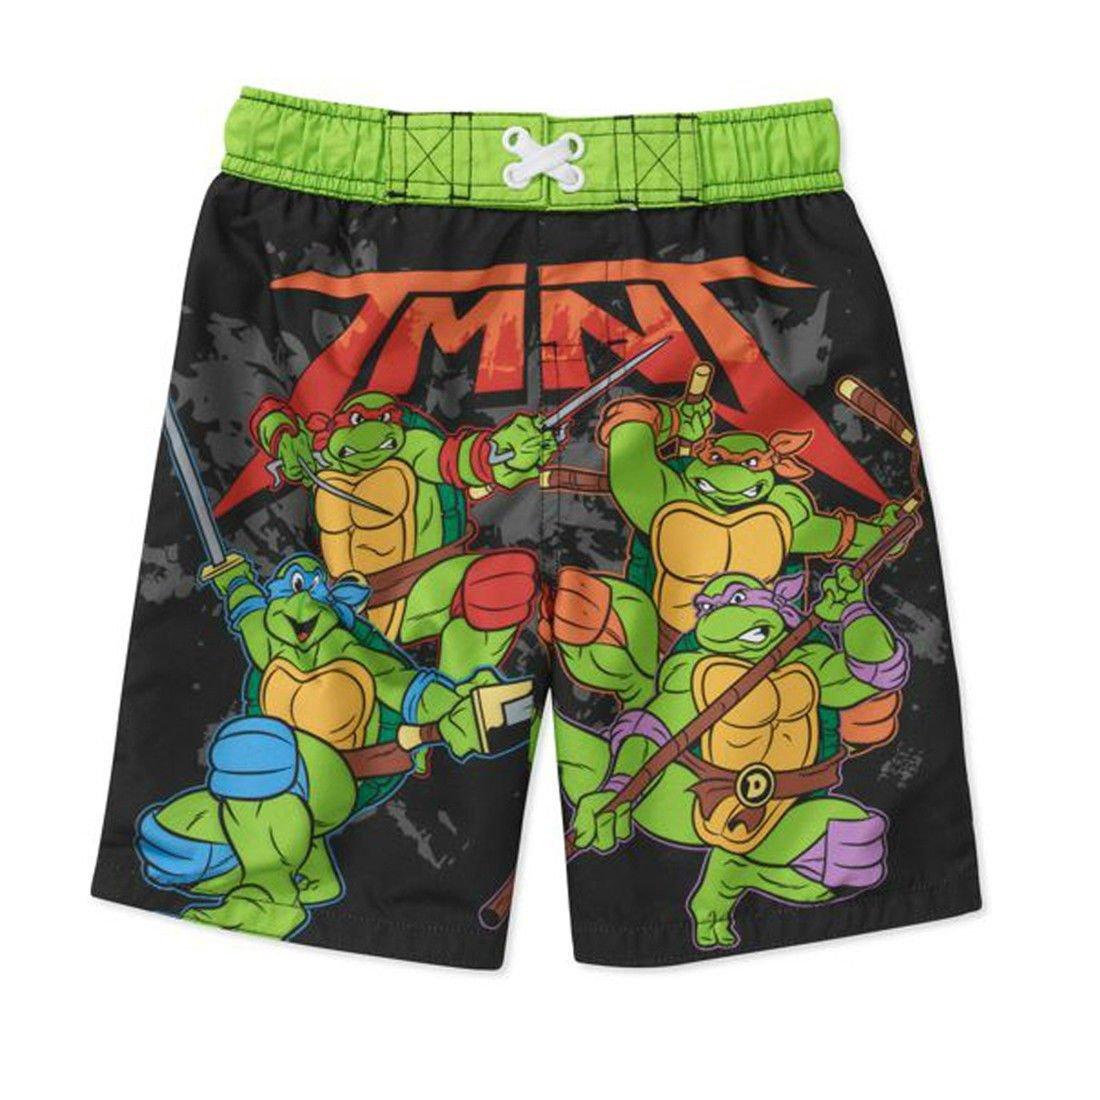 Nickelodeon Teenage Mutant Ninja Turtles Swim Trunks Swim Shorts Little Boys' Size 3T